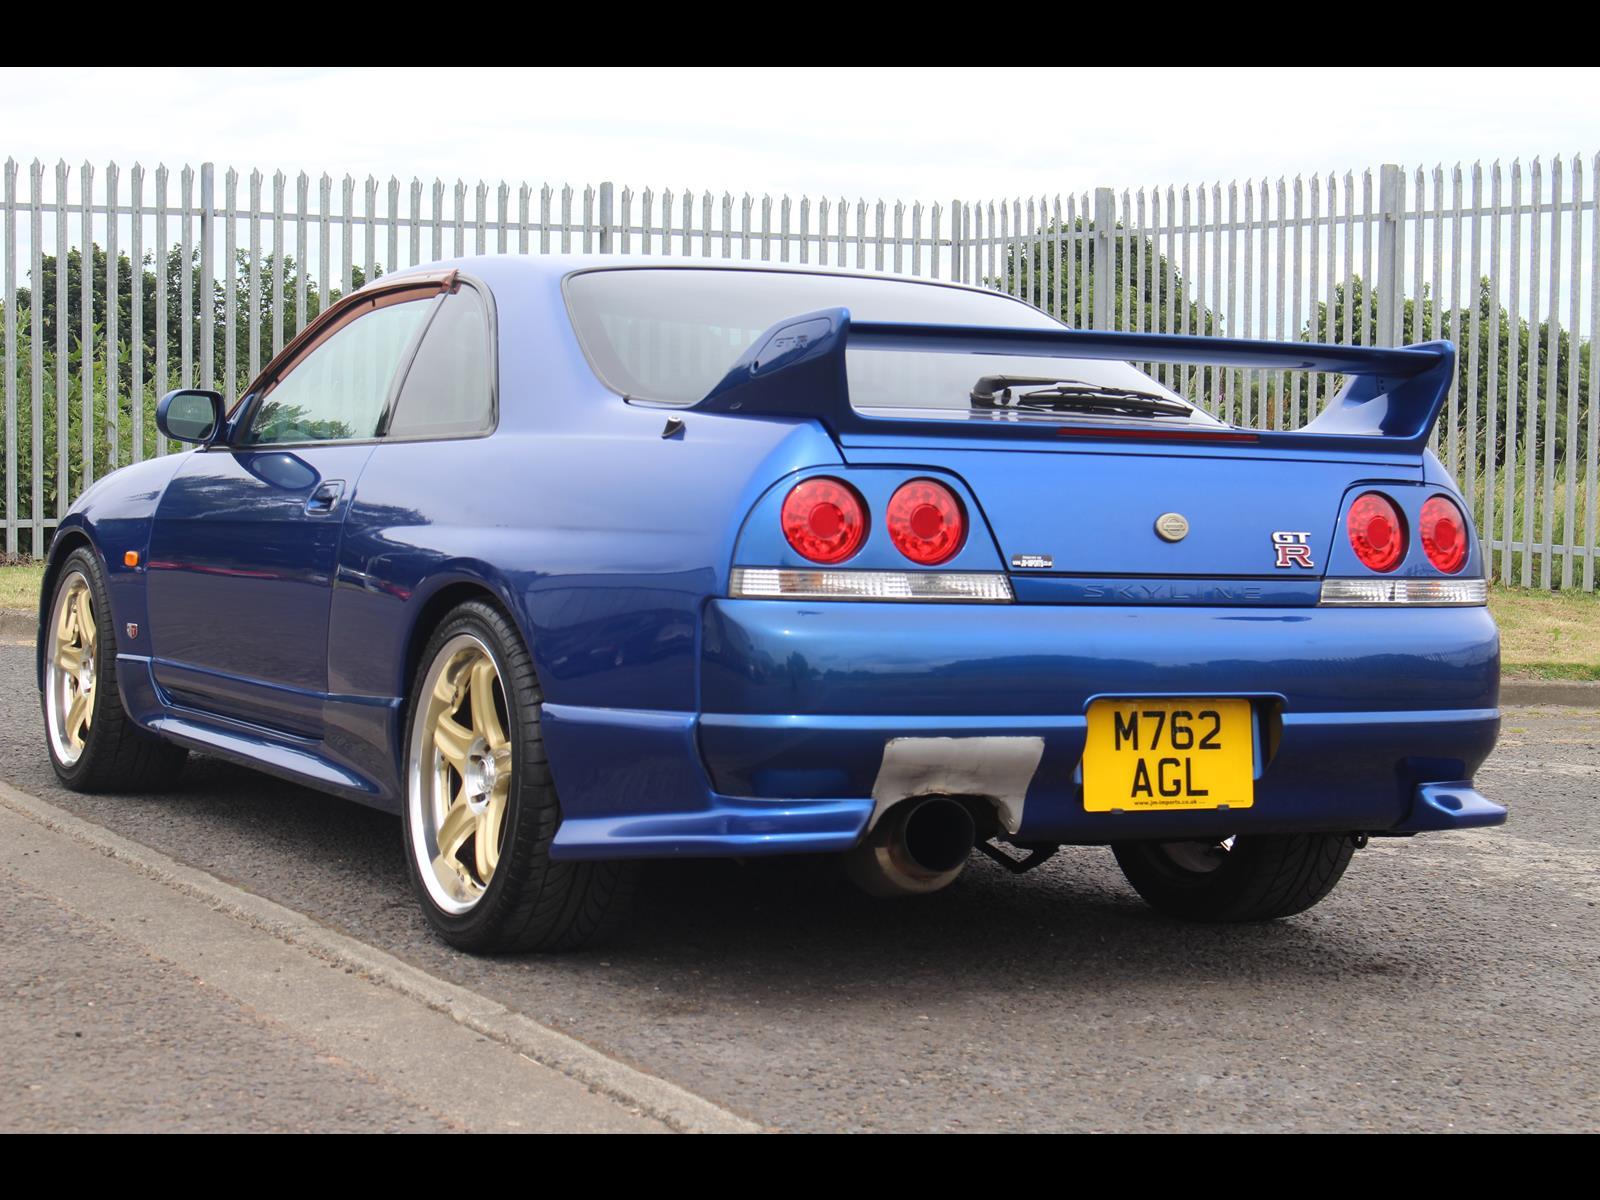 1995 Nissan Skyline R33 GTR 5 Speed Manual - JM-Imports